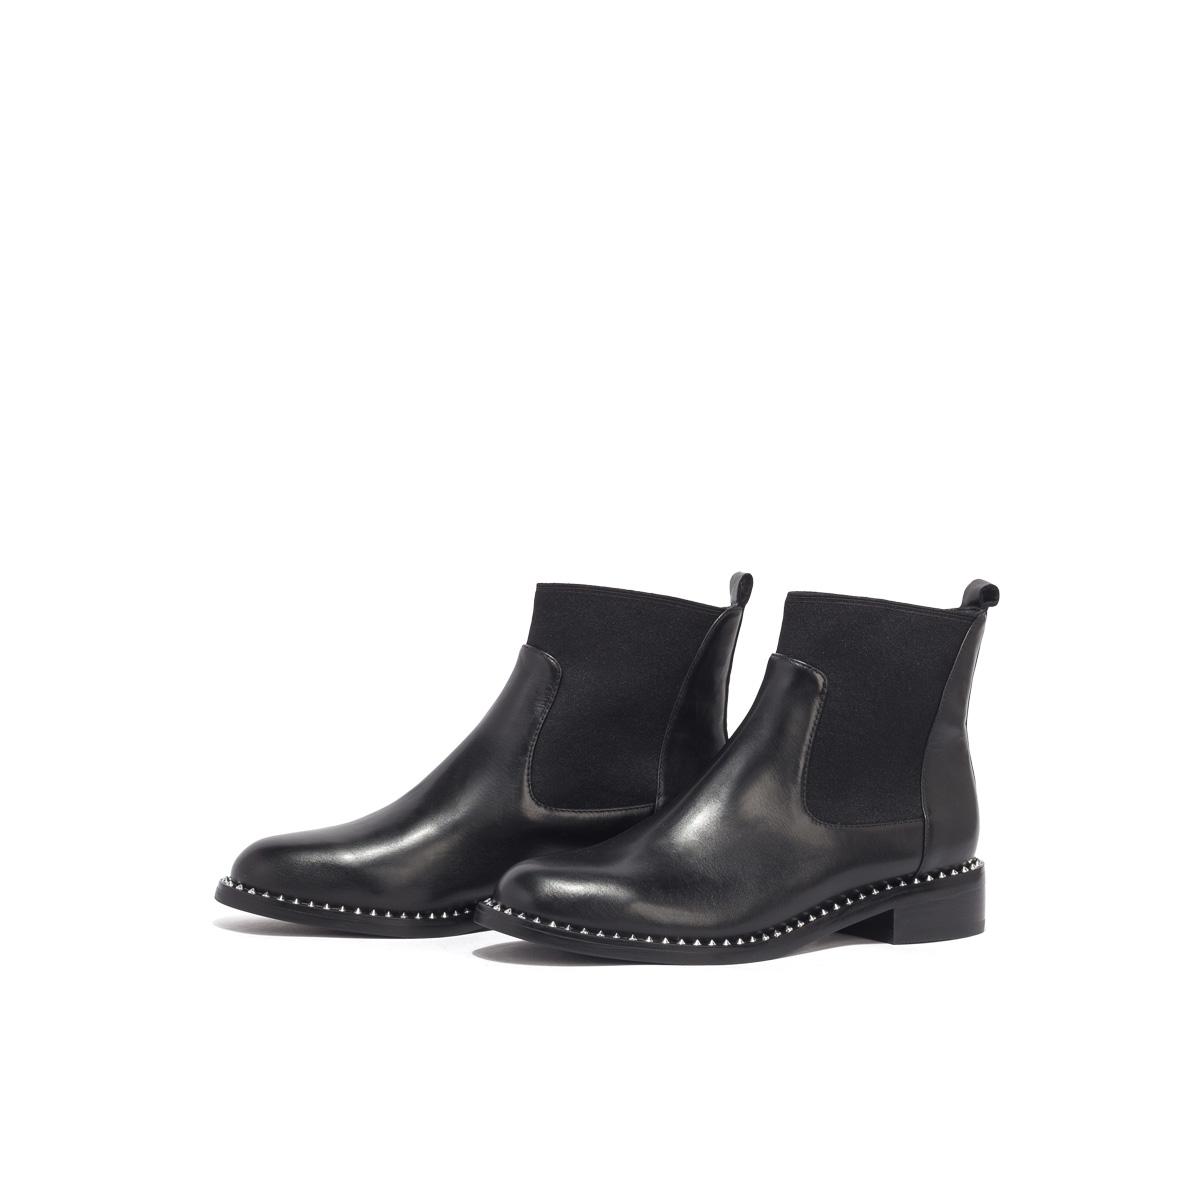 SS03116326 星期六英伦风切尔西靴女冬季新款铆钉圆头套脚短靴女靴